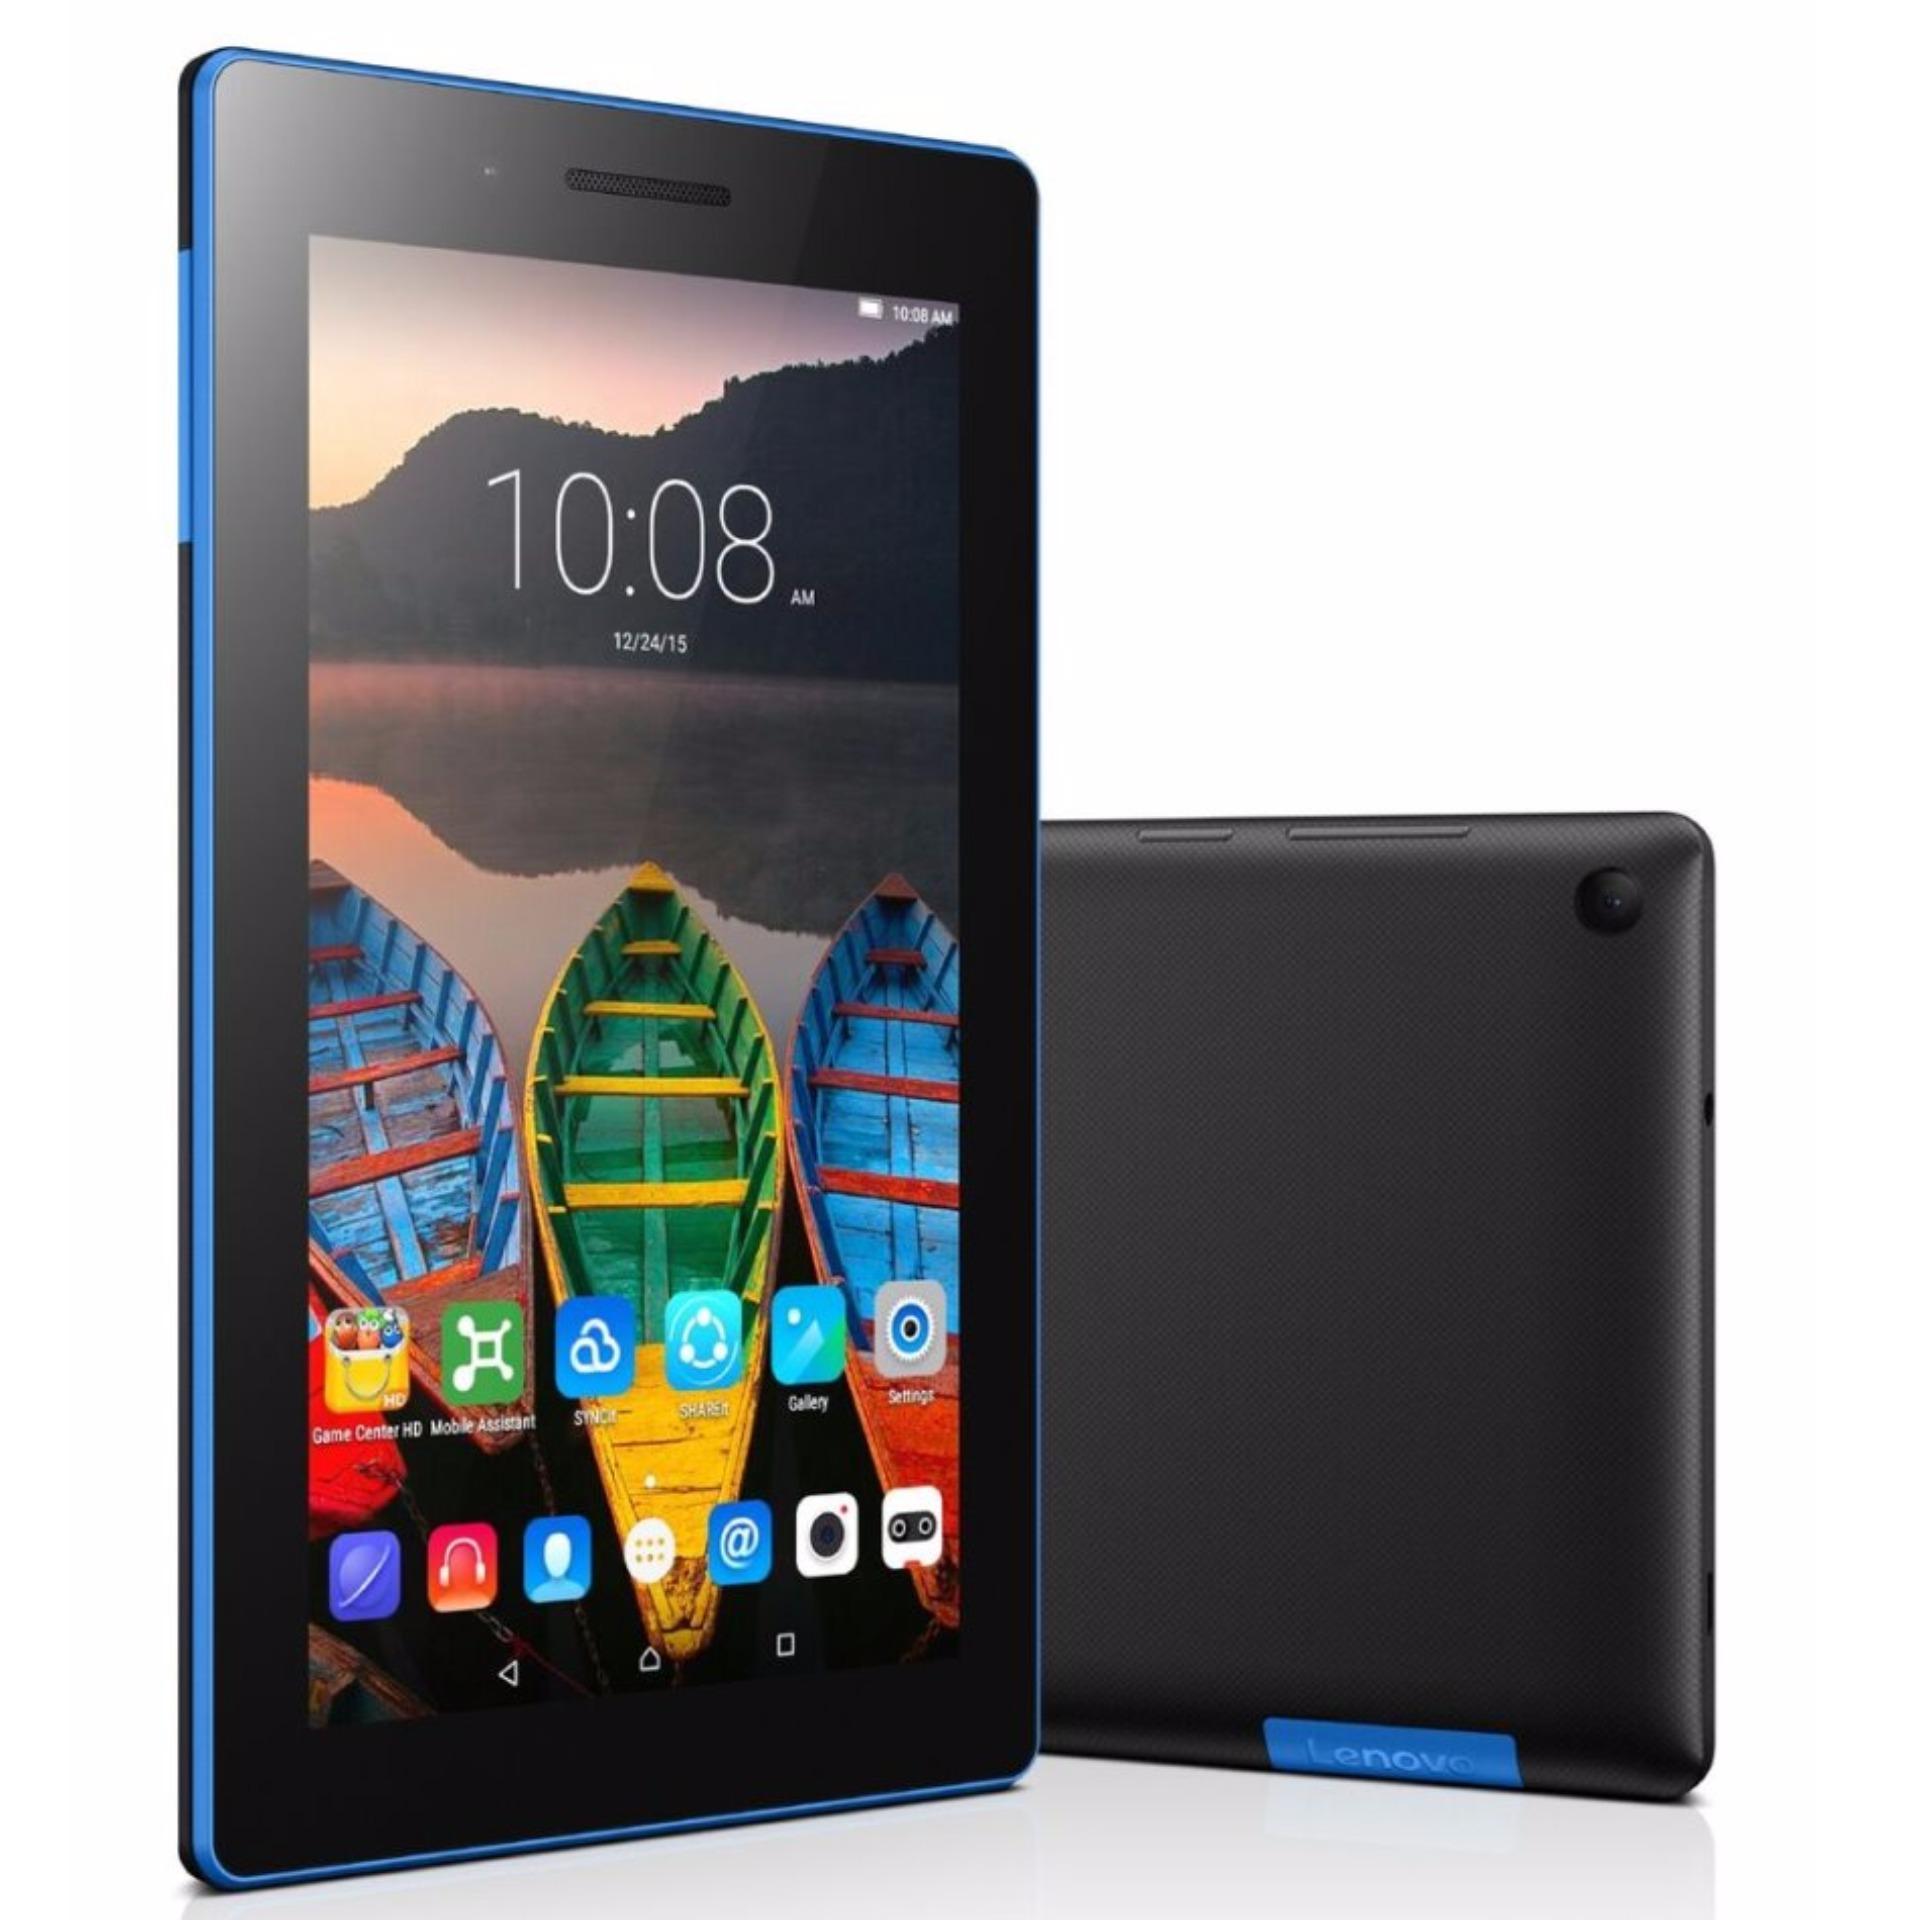 Lenovo Tab 7 Essential Tablet with 3G + WiFi (Black) – 16GB + 2GB (1 Year Warranty by Lenovo SG ) New 2018 Model